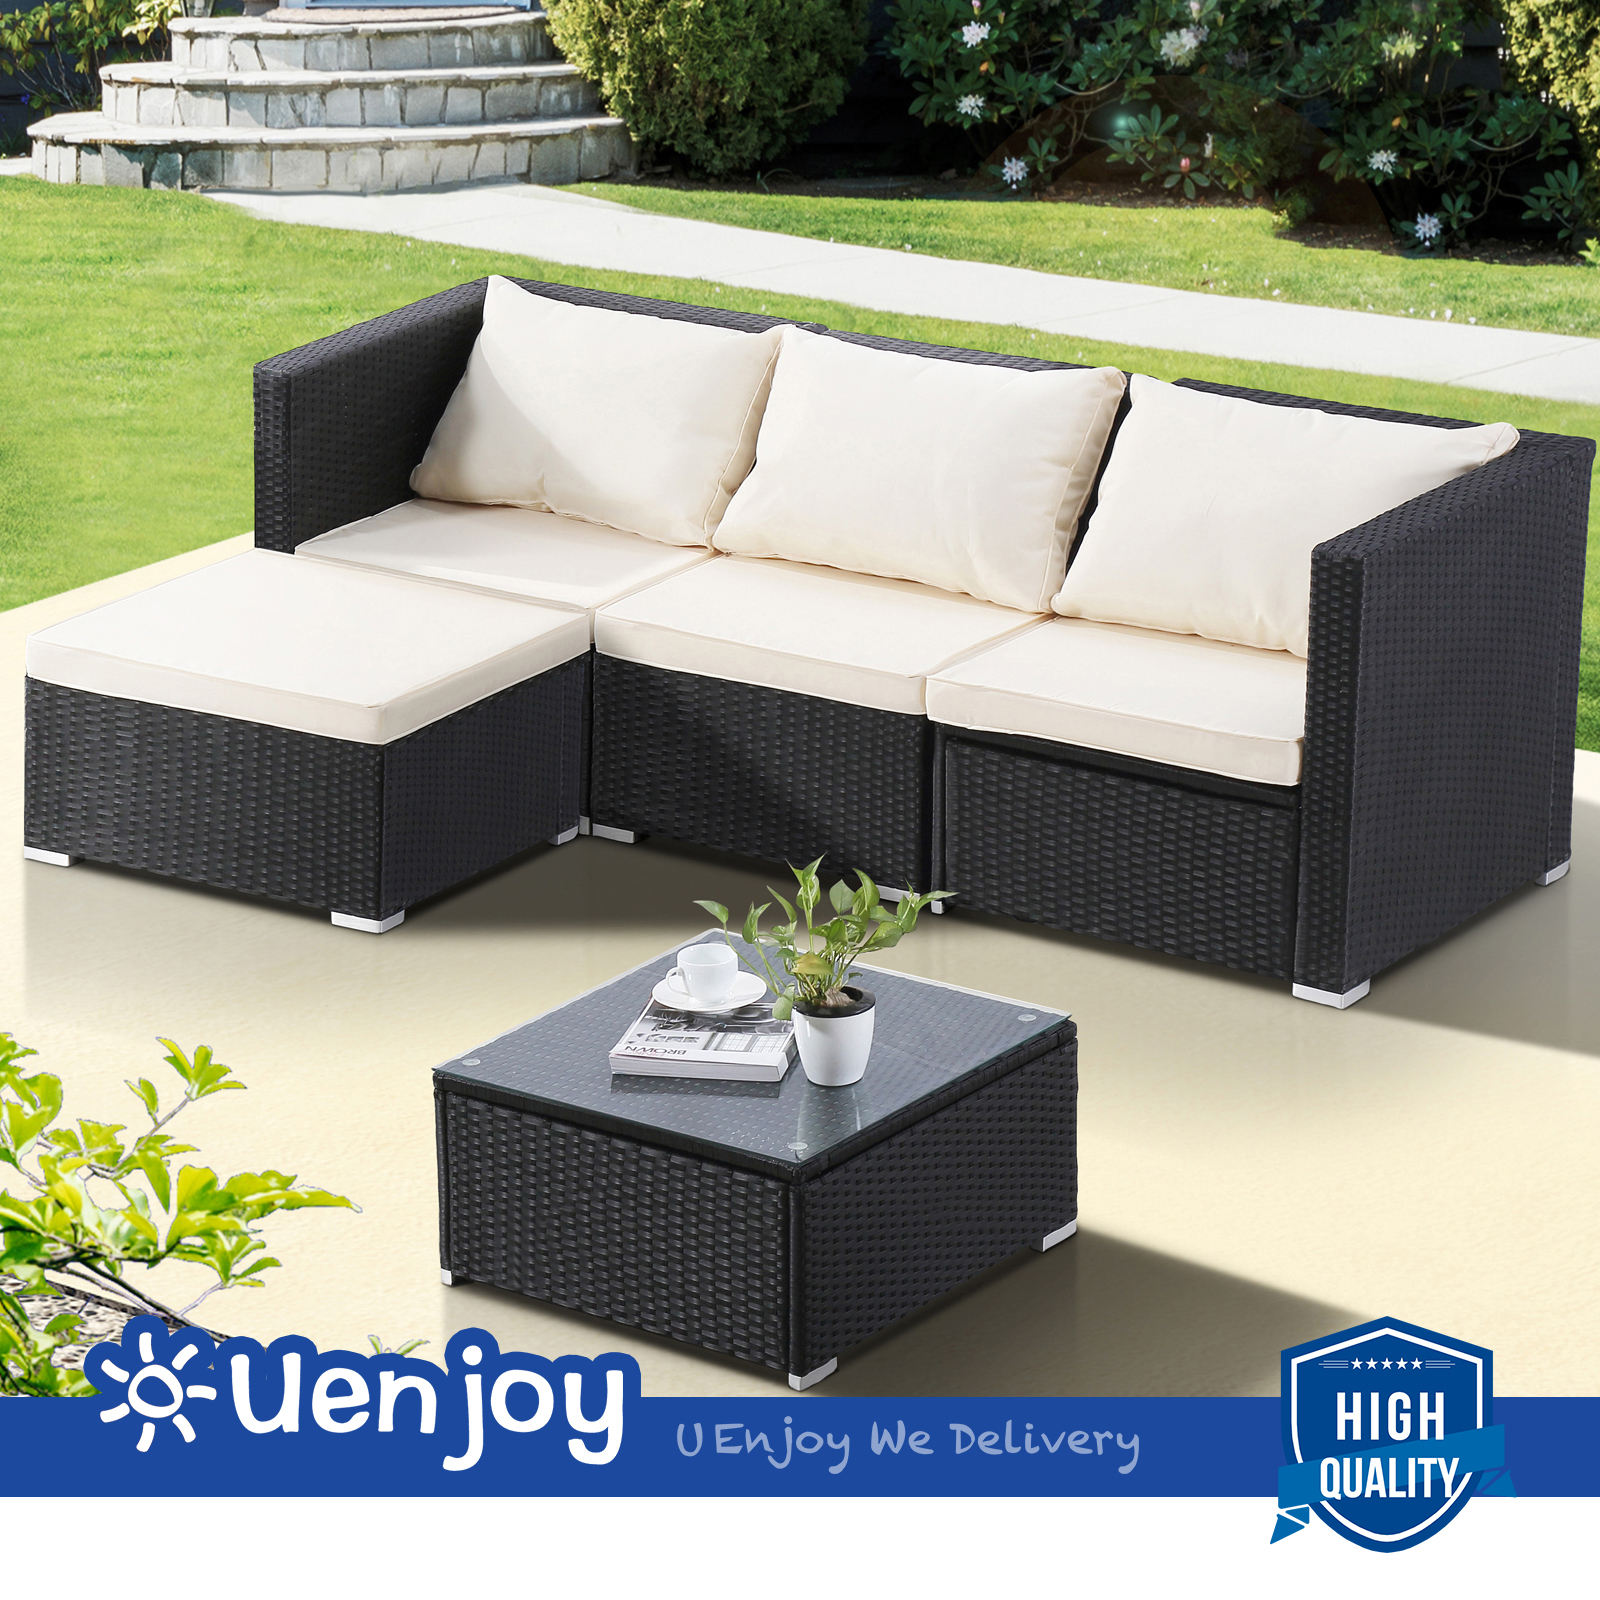 5 Piece Wicker Rattan Patio Sofa Set Garden Furniture Outdoor